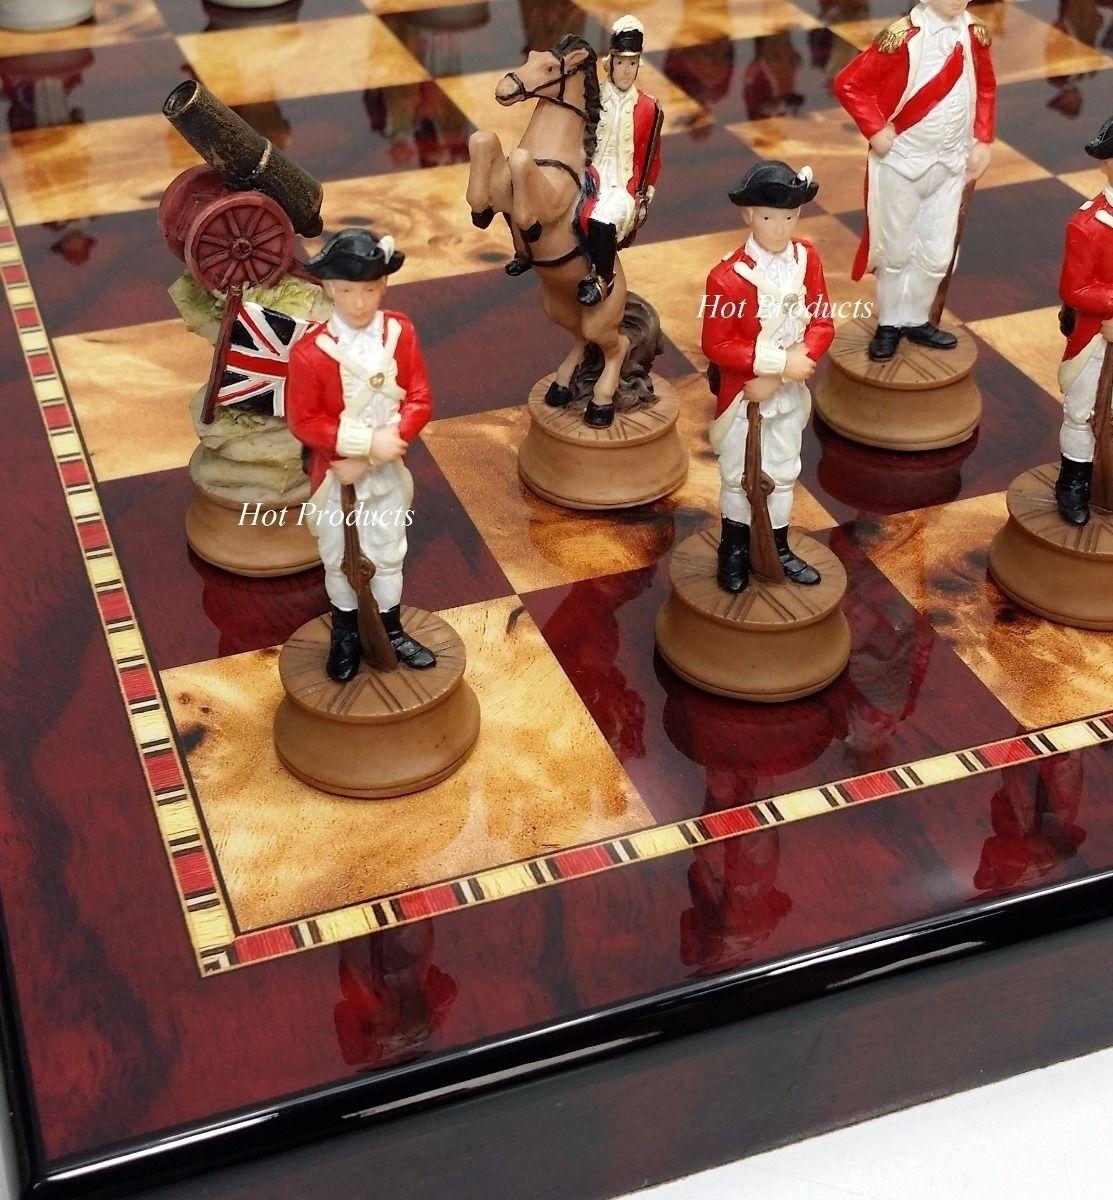 Guerra Revolucionaria juego de ajedrez acabado Cherry placa 18  Revolución Americana